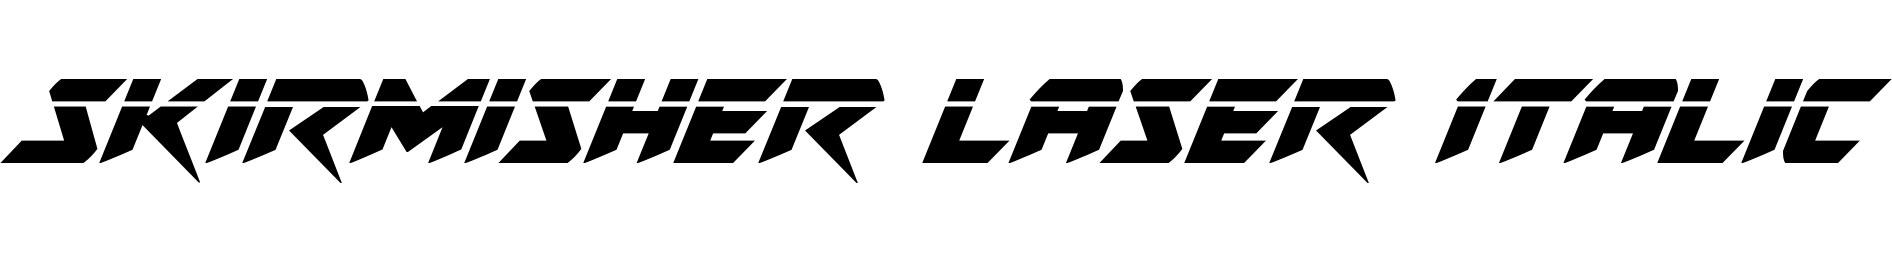 Skirmisher Laser Italic